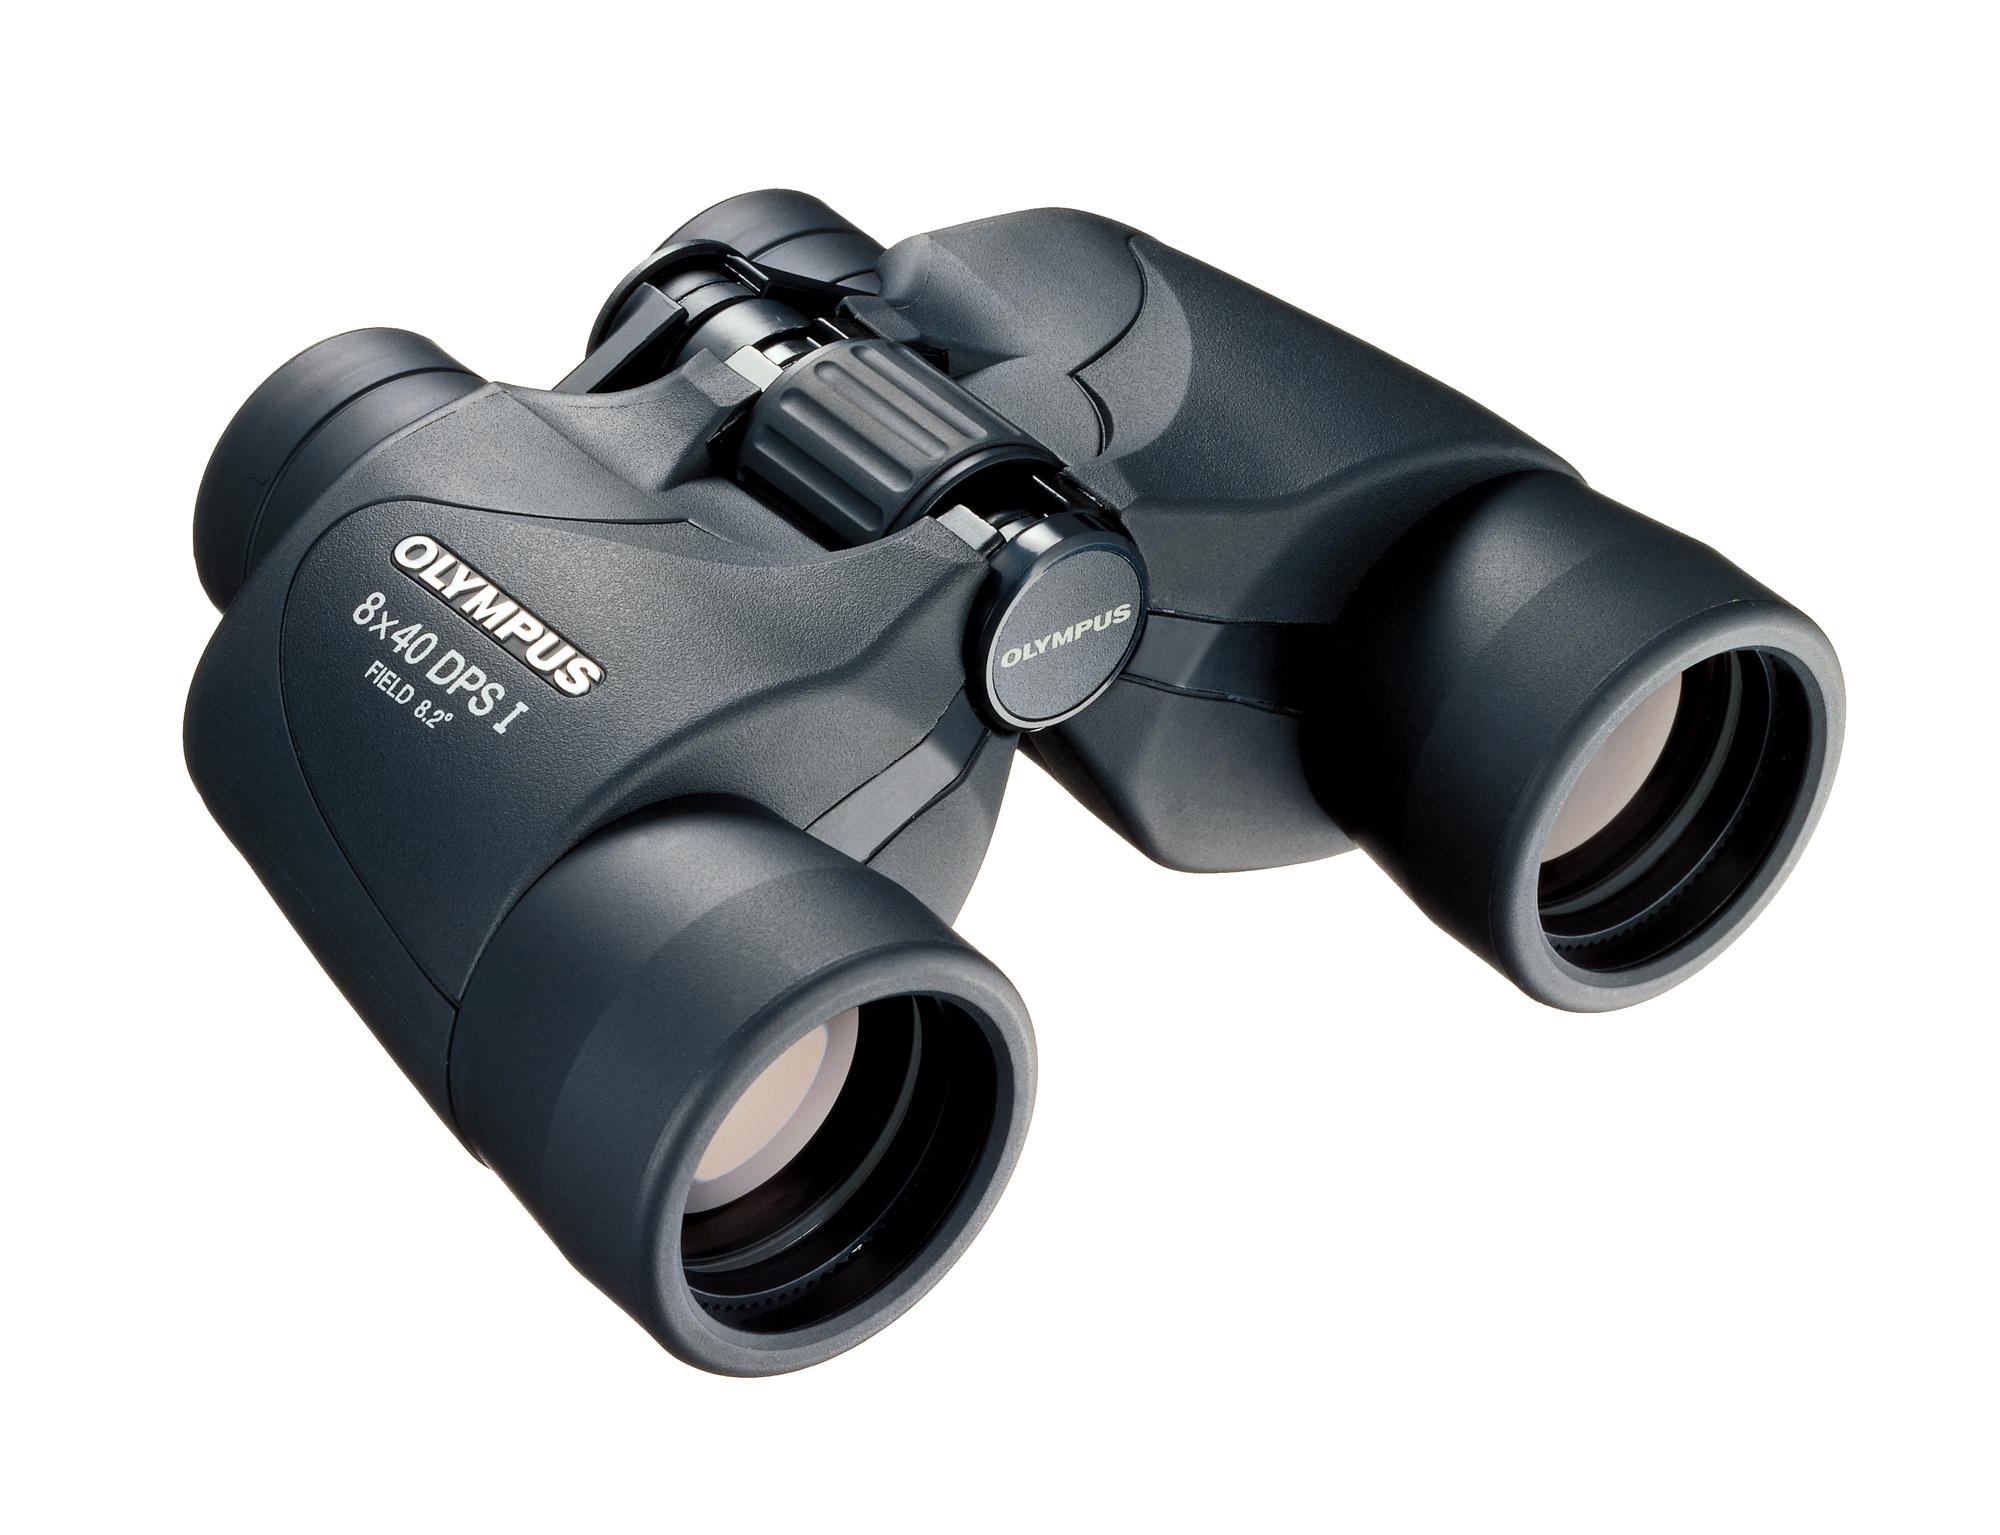 8x40 Dps I Binoculars 8x Magnification Non-waterproof Rubber Coating 1 Year Warranty